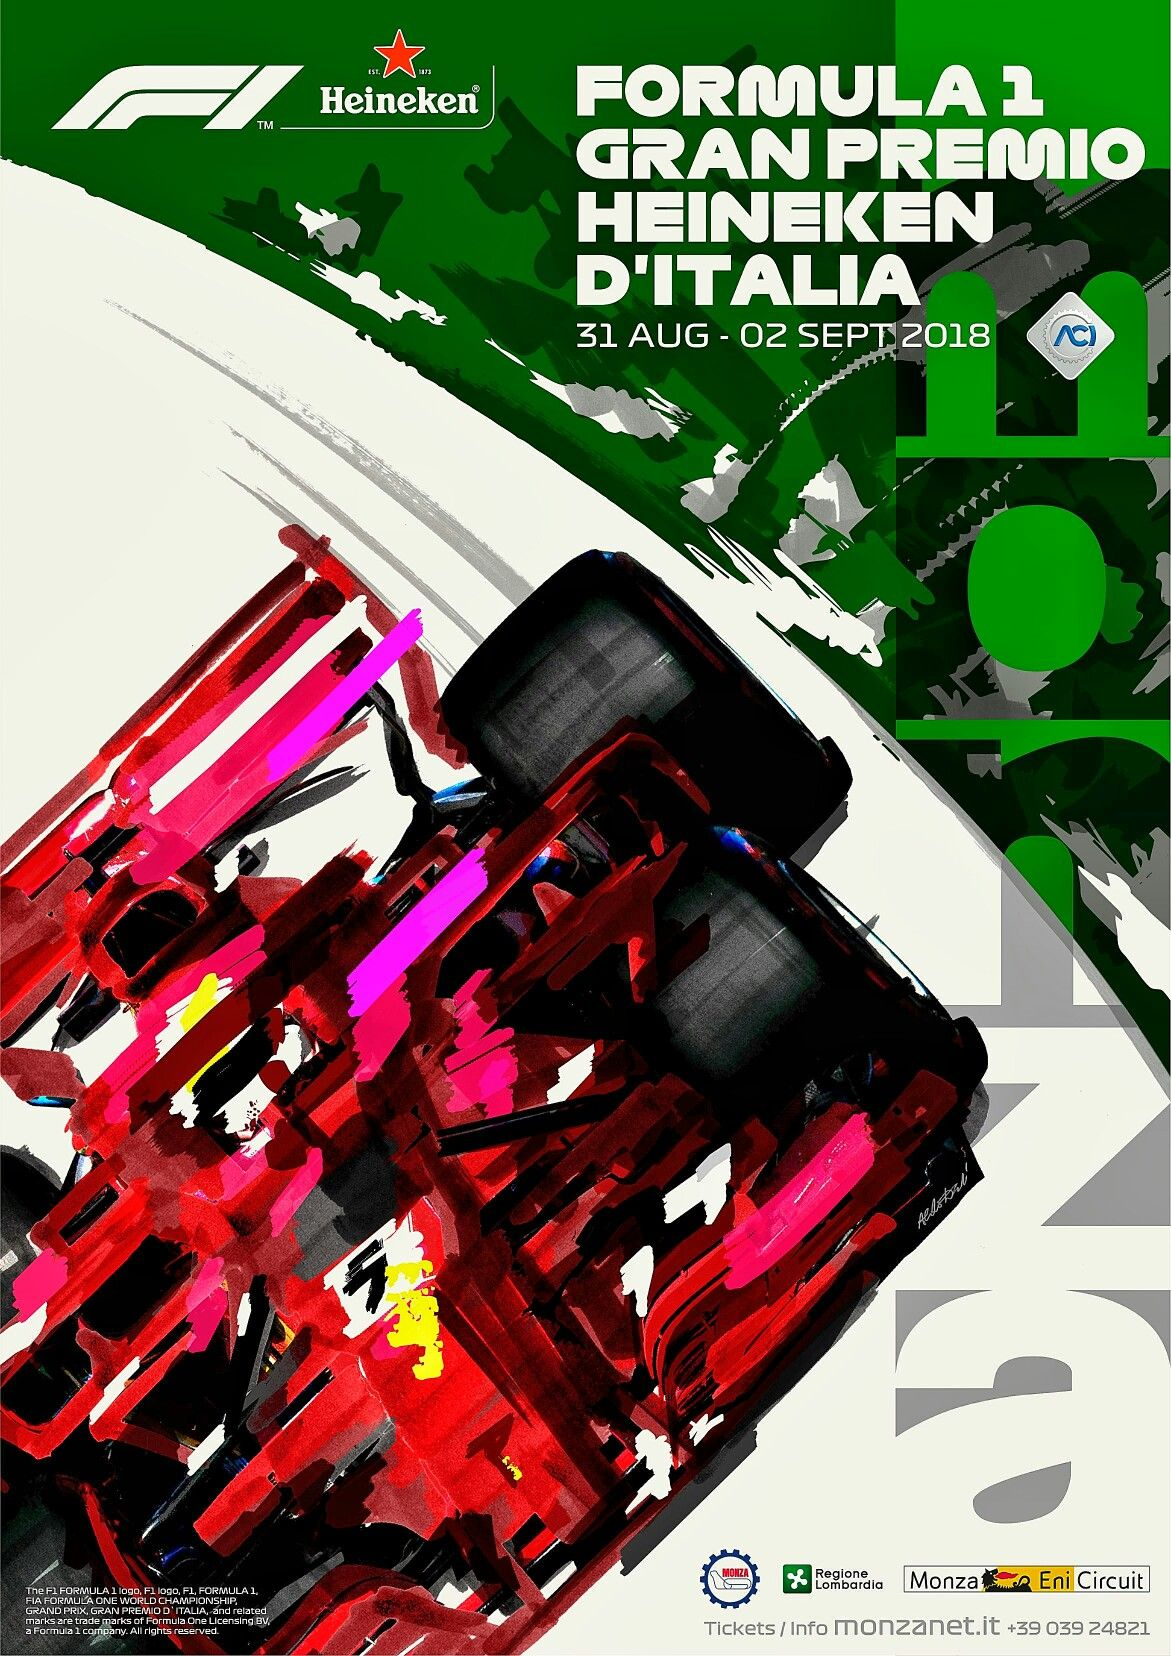 2018 Italian Gp Official Event Poster Features Sebastian Vettel S Ferrari Sf71h On The Old Monza Ba Grand Prix Posters Italian Grand Prix Vintage Racing Poster